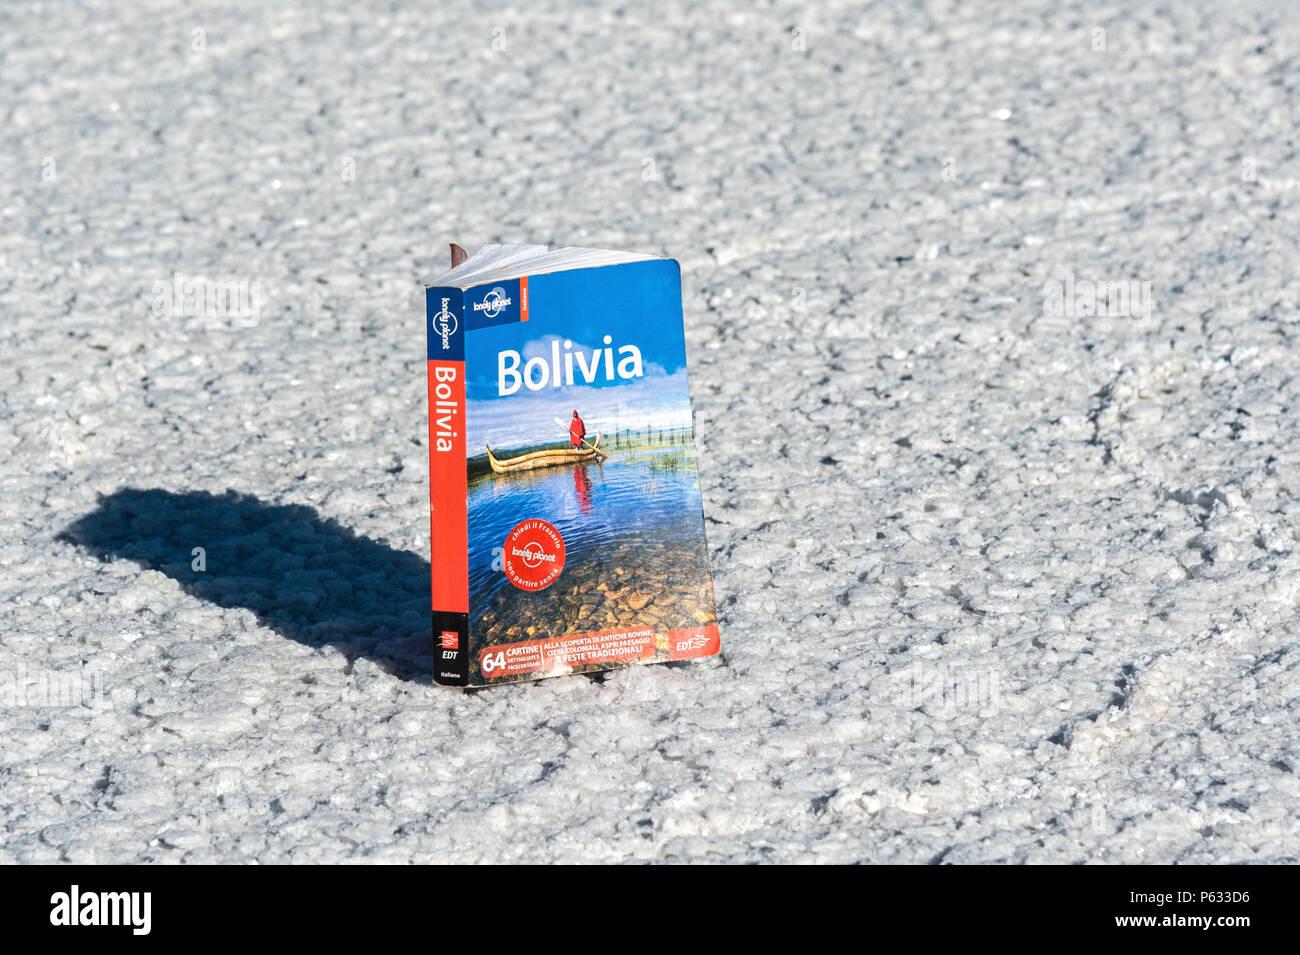 Travel guide on the world's biggest salt plain Salar de Uyuni, Bolivia - South America - Stock Image